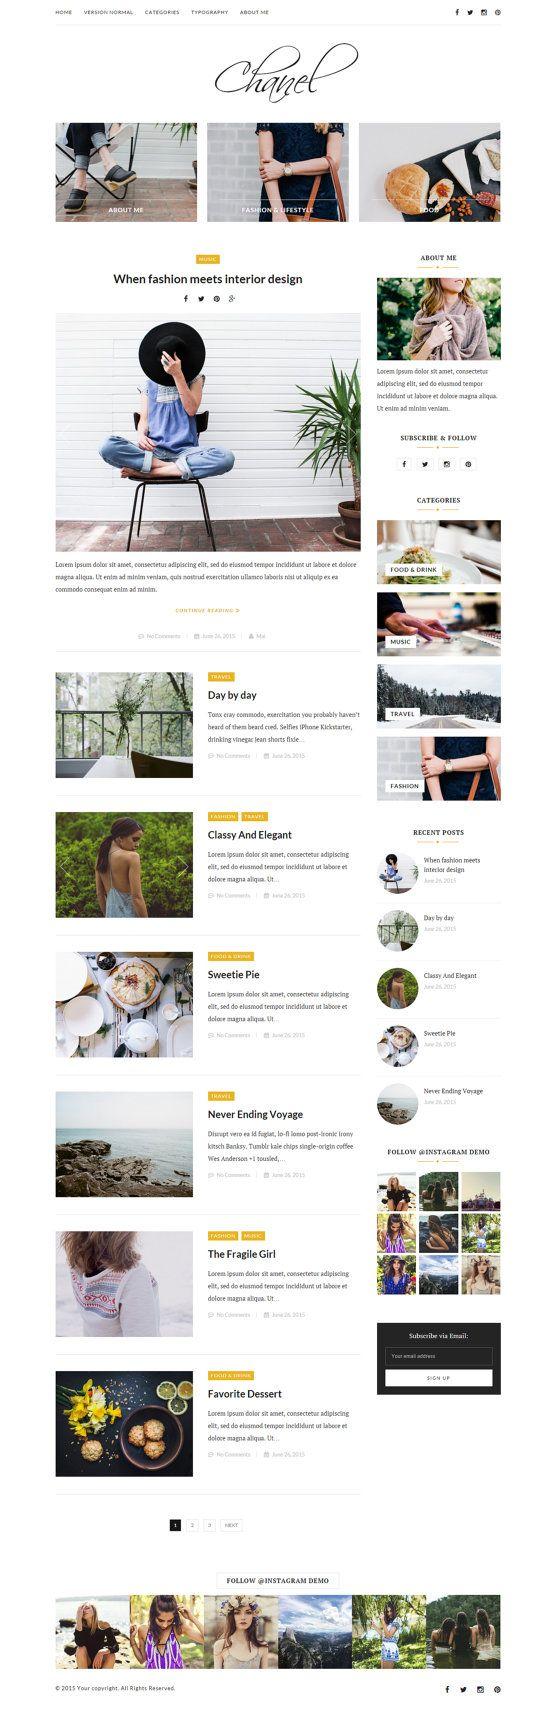 Wordpress theme Feminine wordpress theme by Mailovedesign